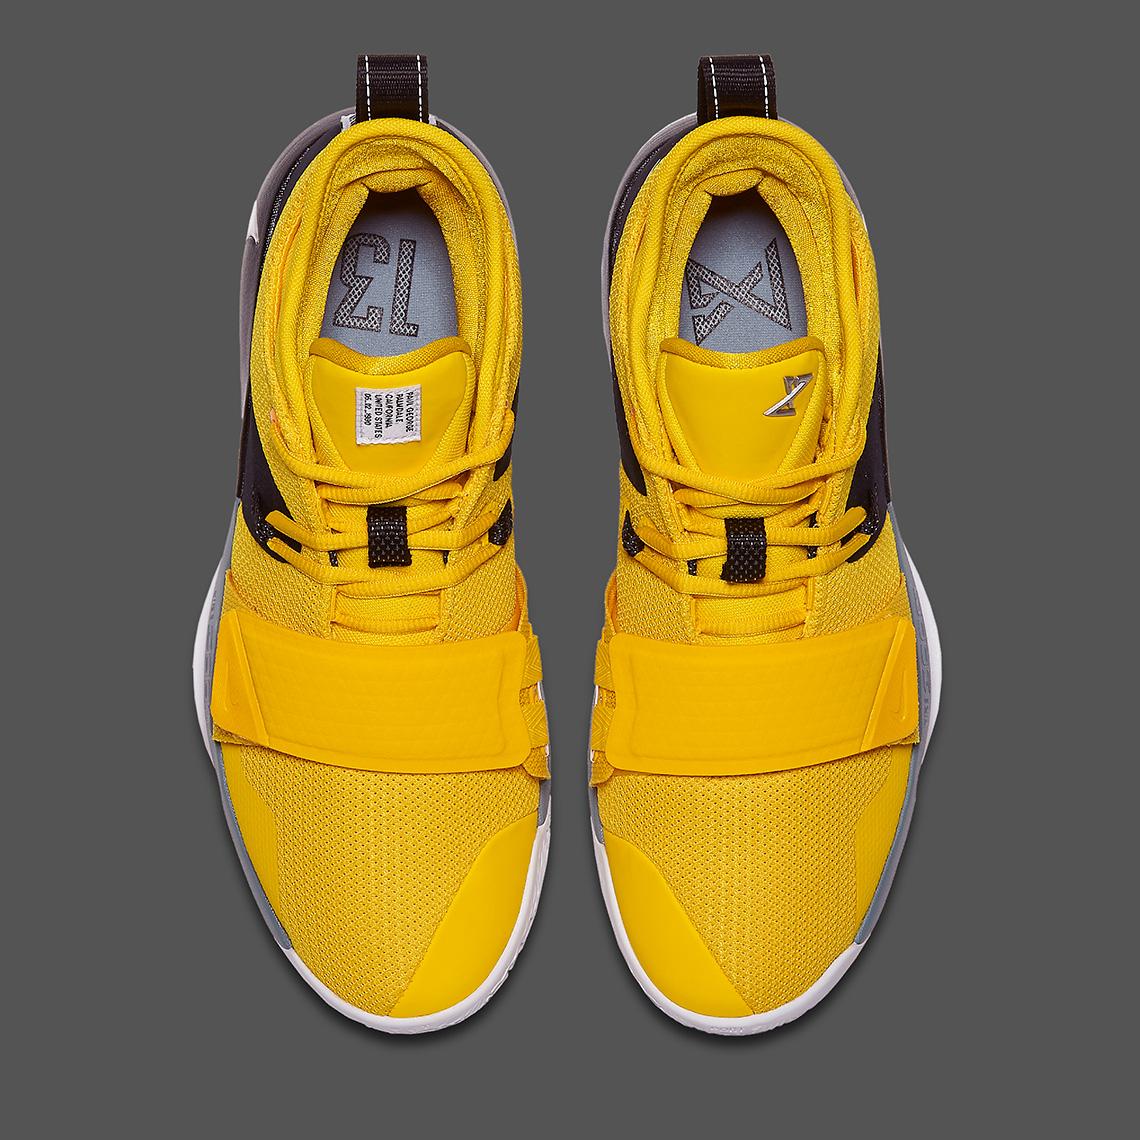 newest 8c25e 8f2bd Nike PG 2.5 Amarillo Chrome Black BQ8452-700 | SneakerNews.com